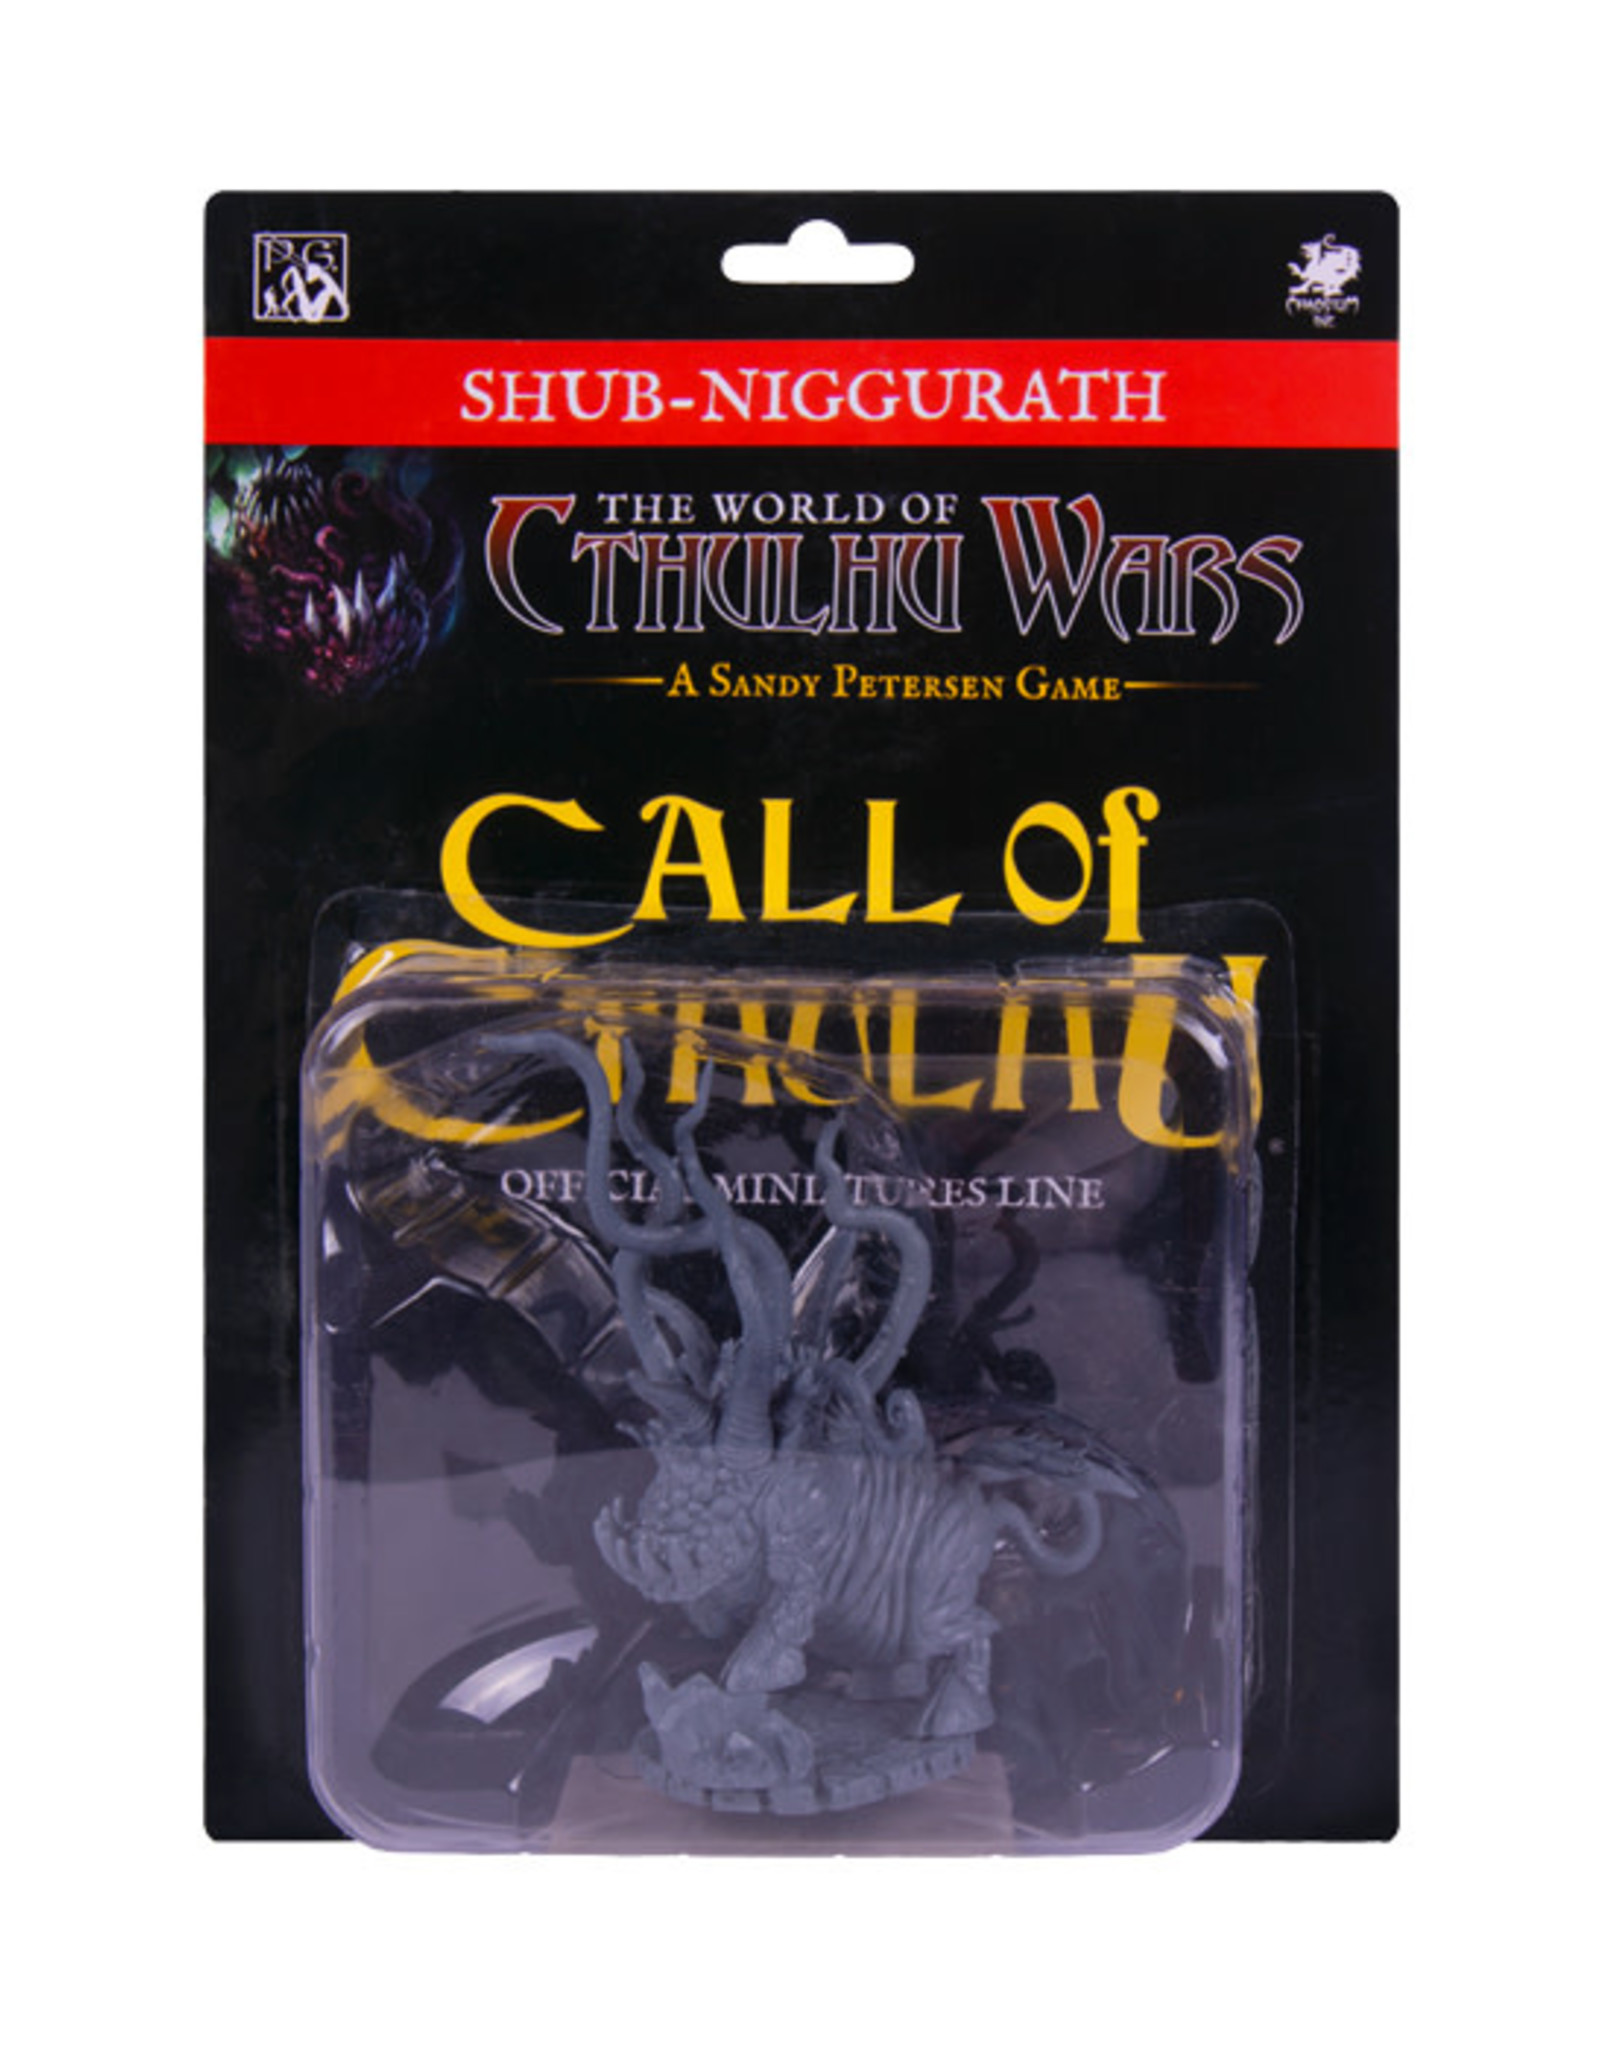 Call of Cthulhu: Miniature - Shub-Niggurath